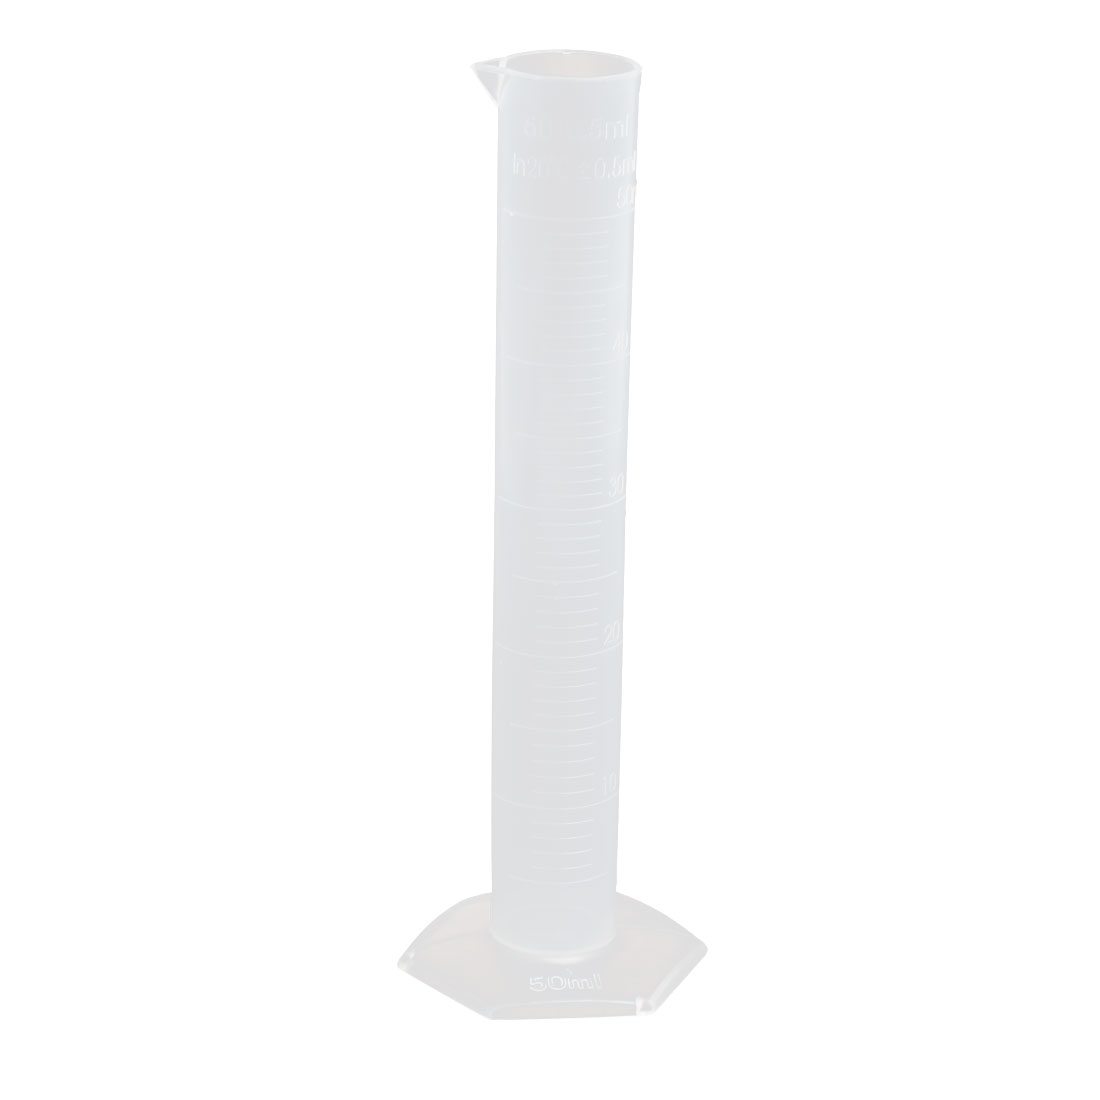 50mL Hex Base Liquid Measurement Plastic Graduated Measuring Cylinder Beaker